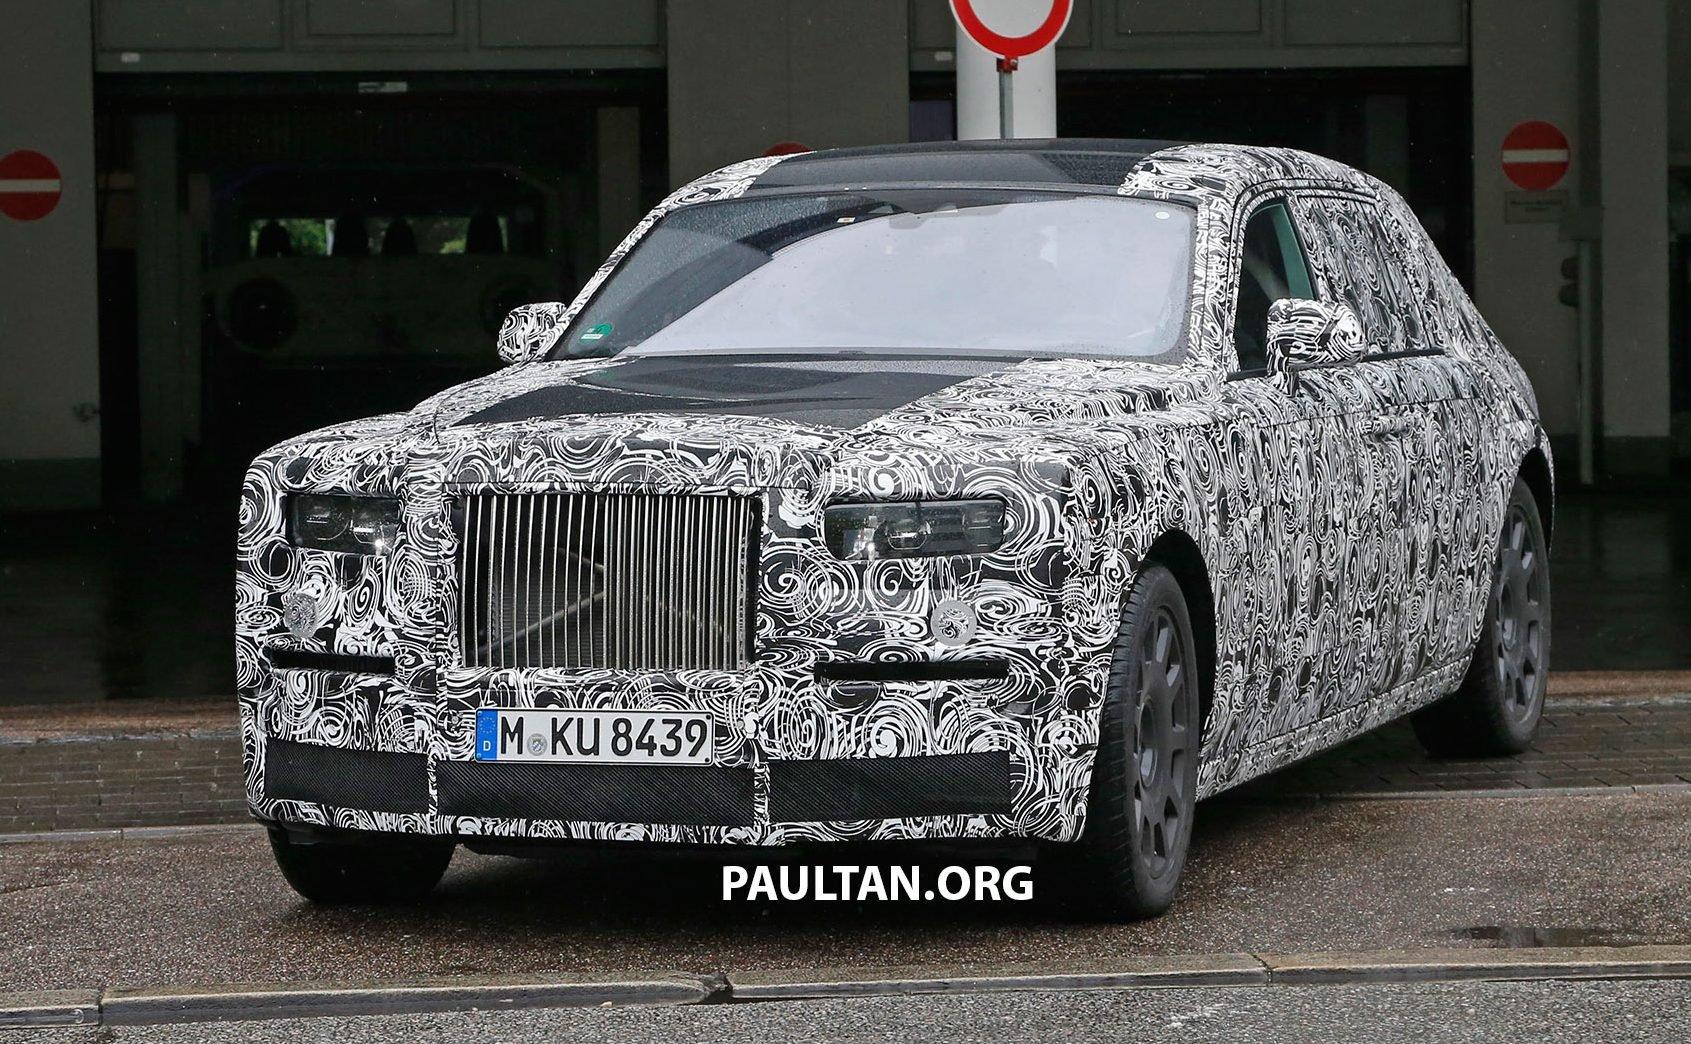 2017 Rolls Royce Phantom >> SPIED: 2017 Rolls-Royce Phantom, including interior Image 505269